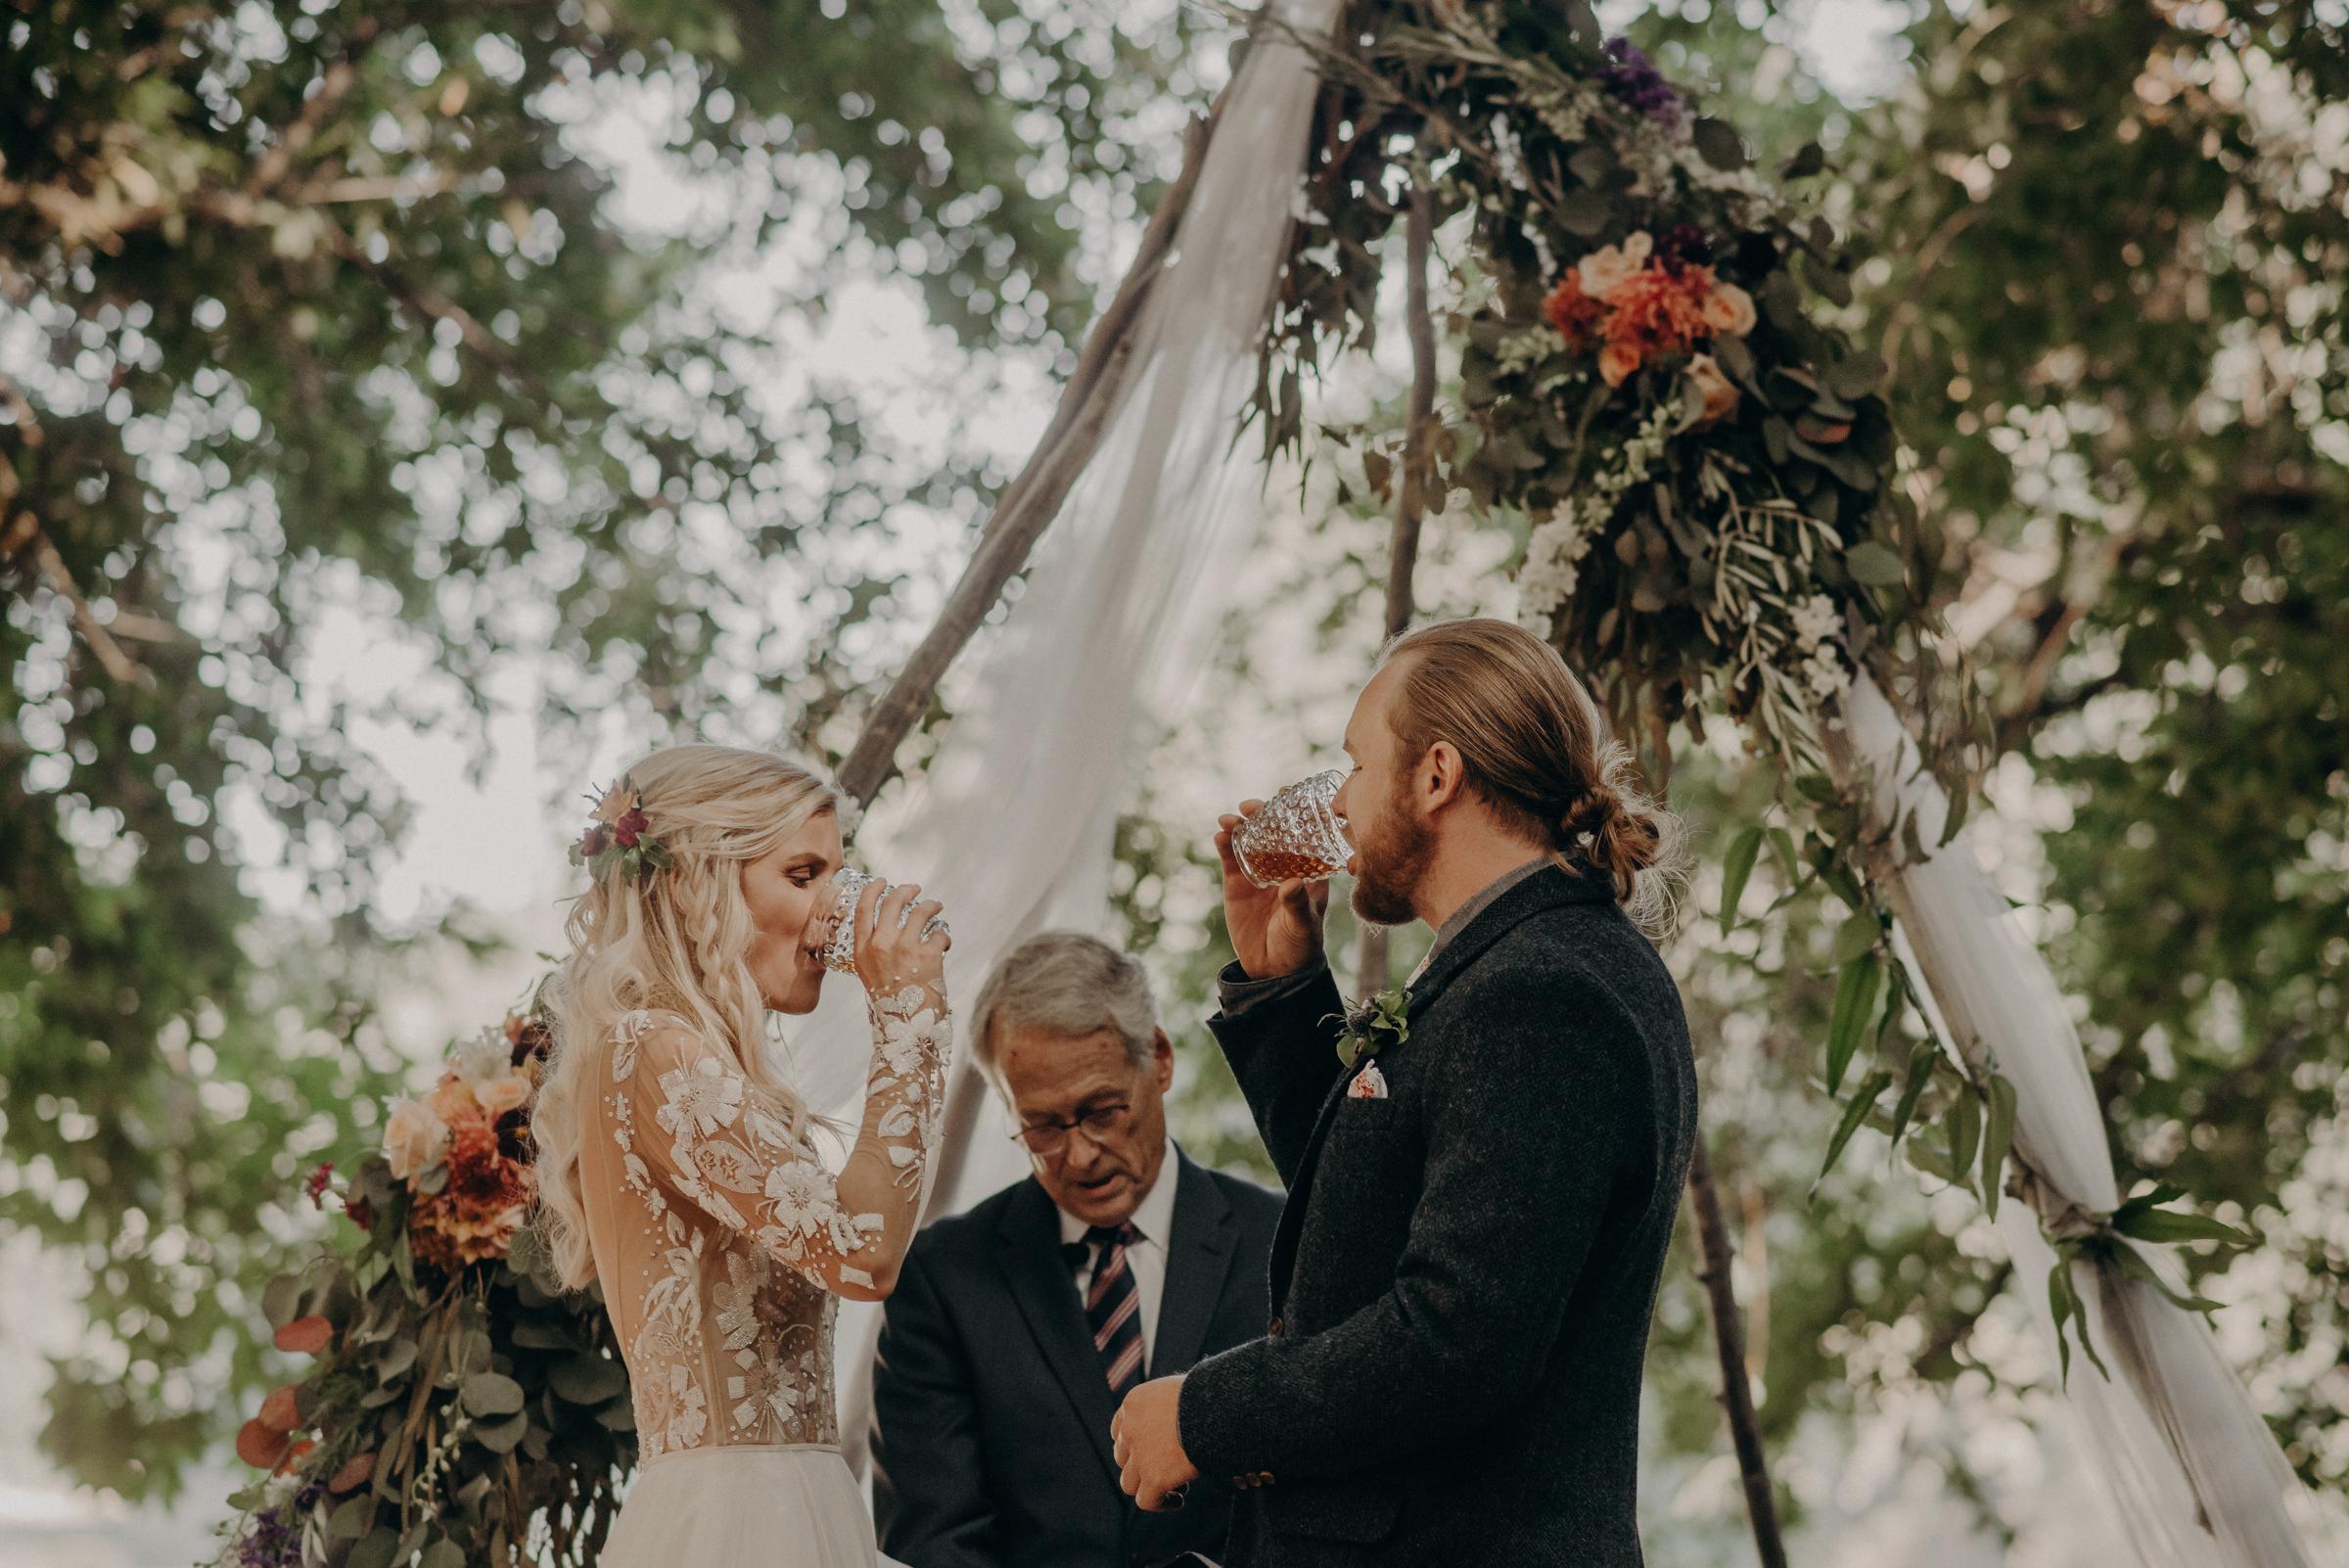 IsaiahAndTaylor.com - California Destination Elopement, Lake Leonard Reserve Wedding, Ukiah-111.jpg